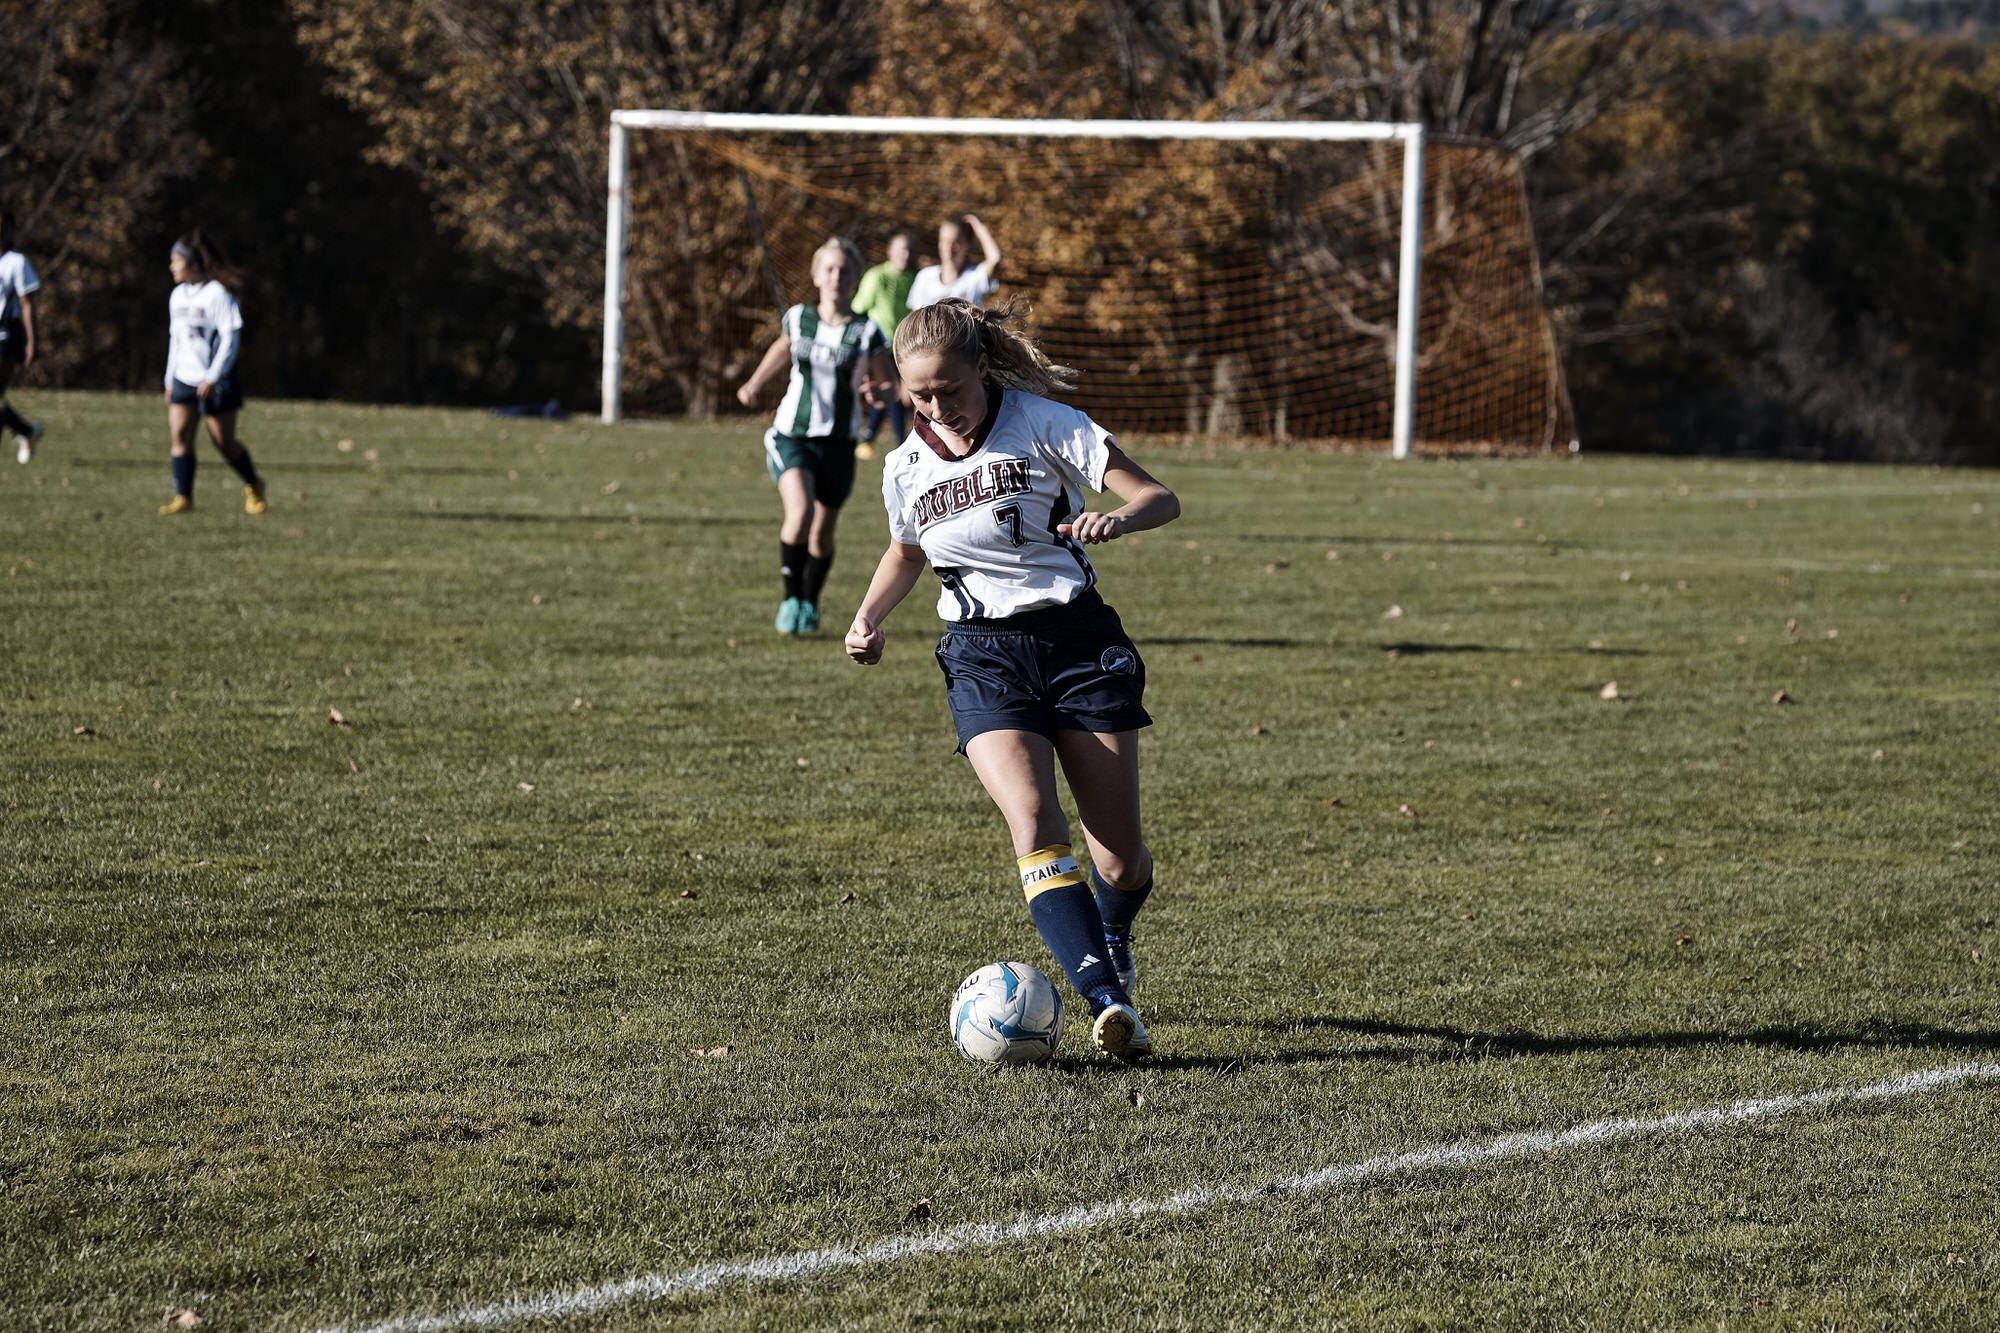 Girls Varsity Soccer vs. Putney School - October 26, 2018 - 002.jpg